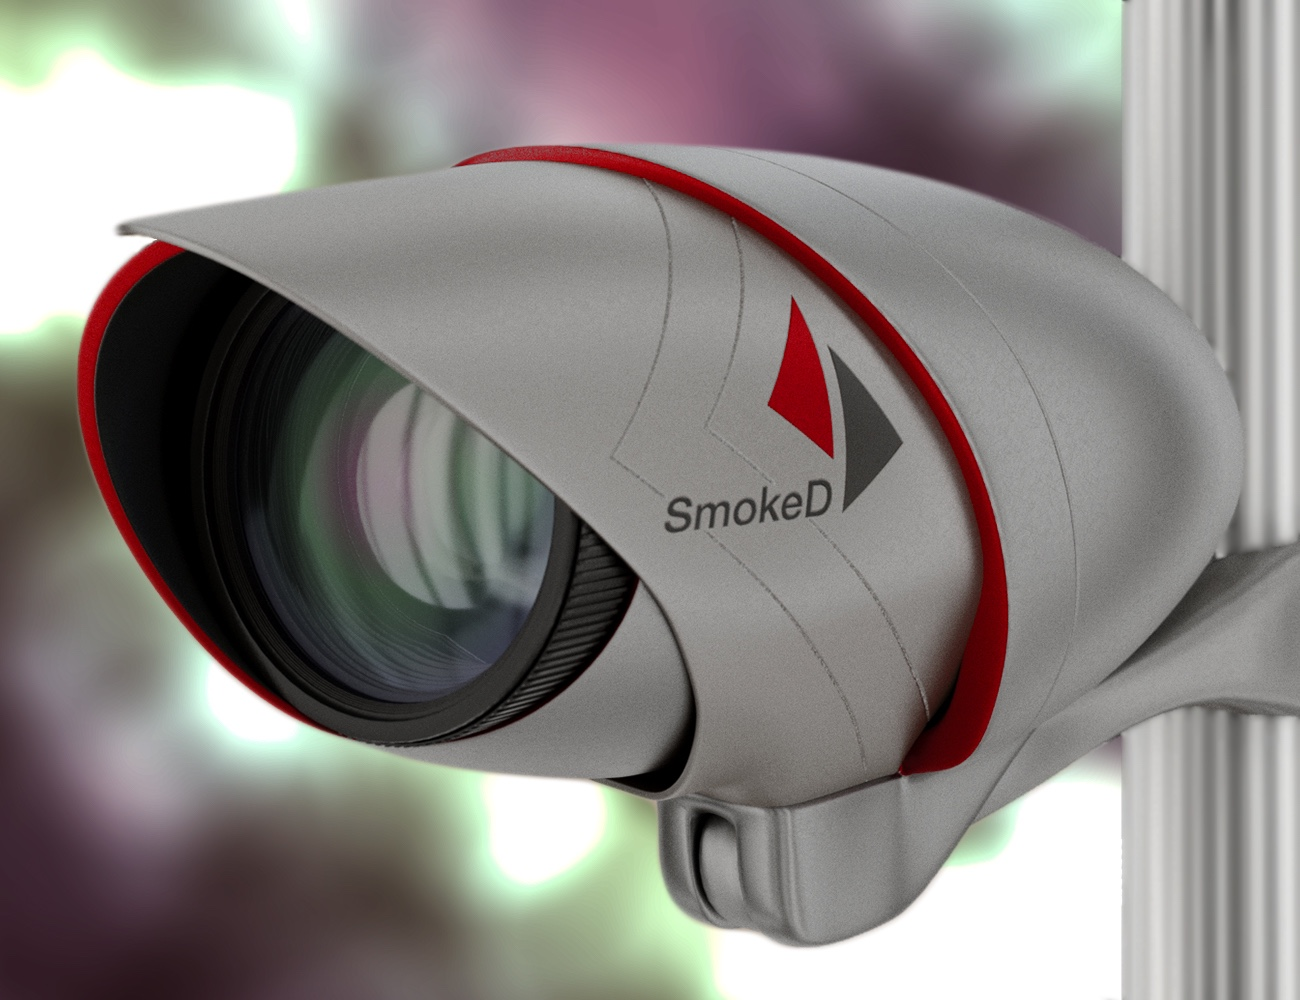 SmokeD+Smart+Fire+Detection+Camera